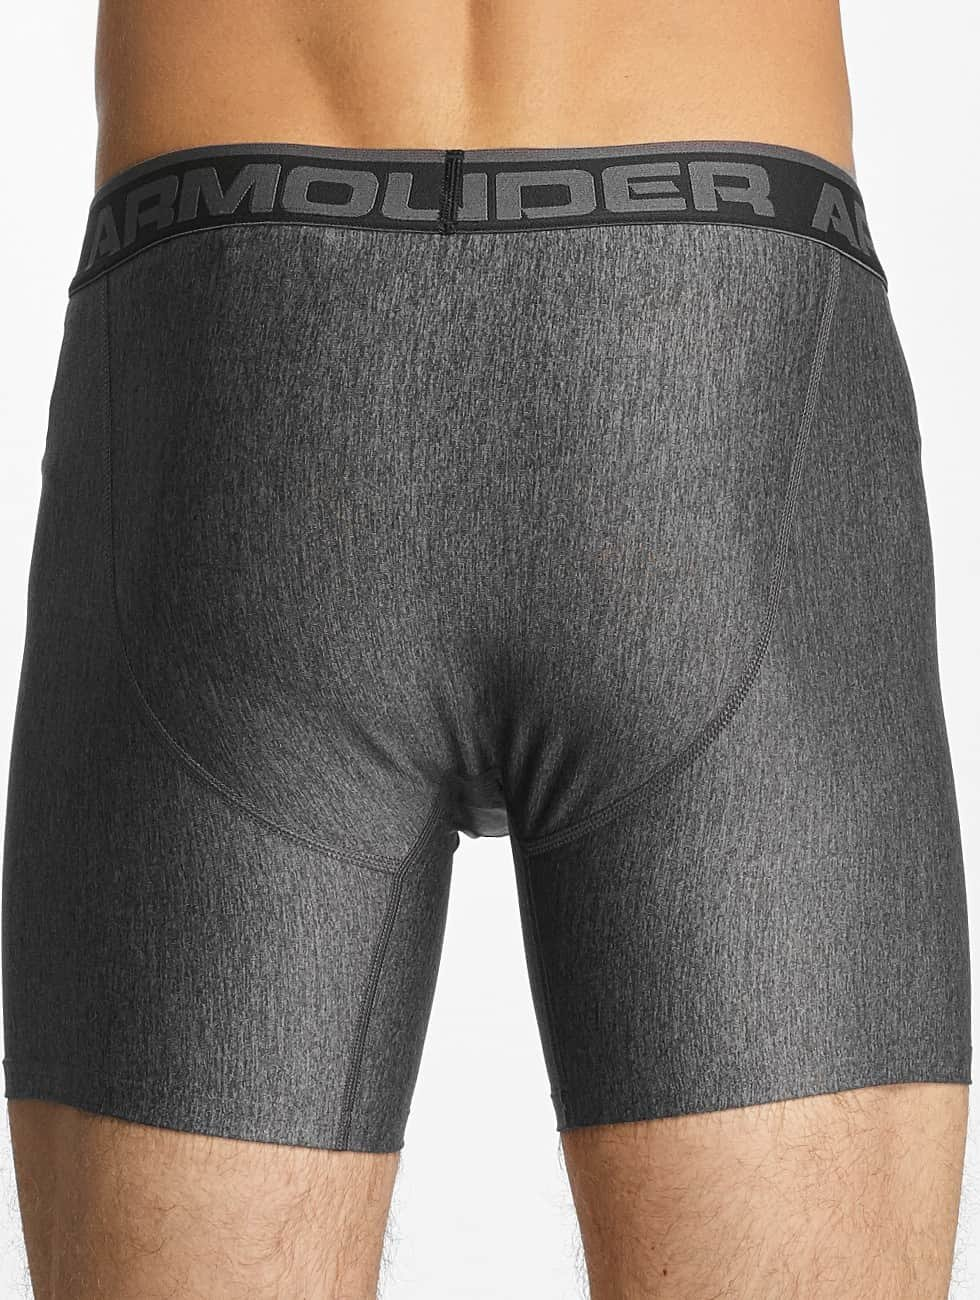 Under Armour Boxer Short The Original 6'' gray